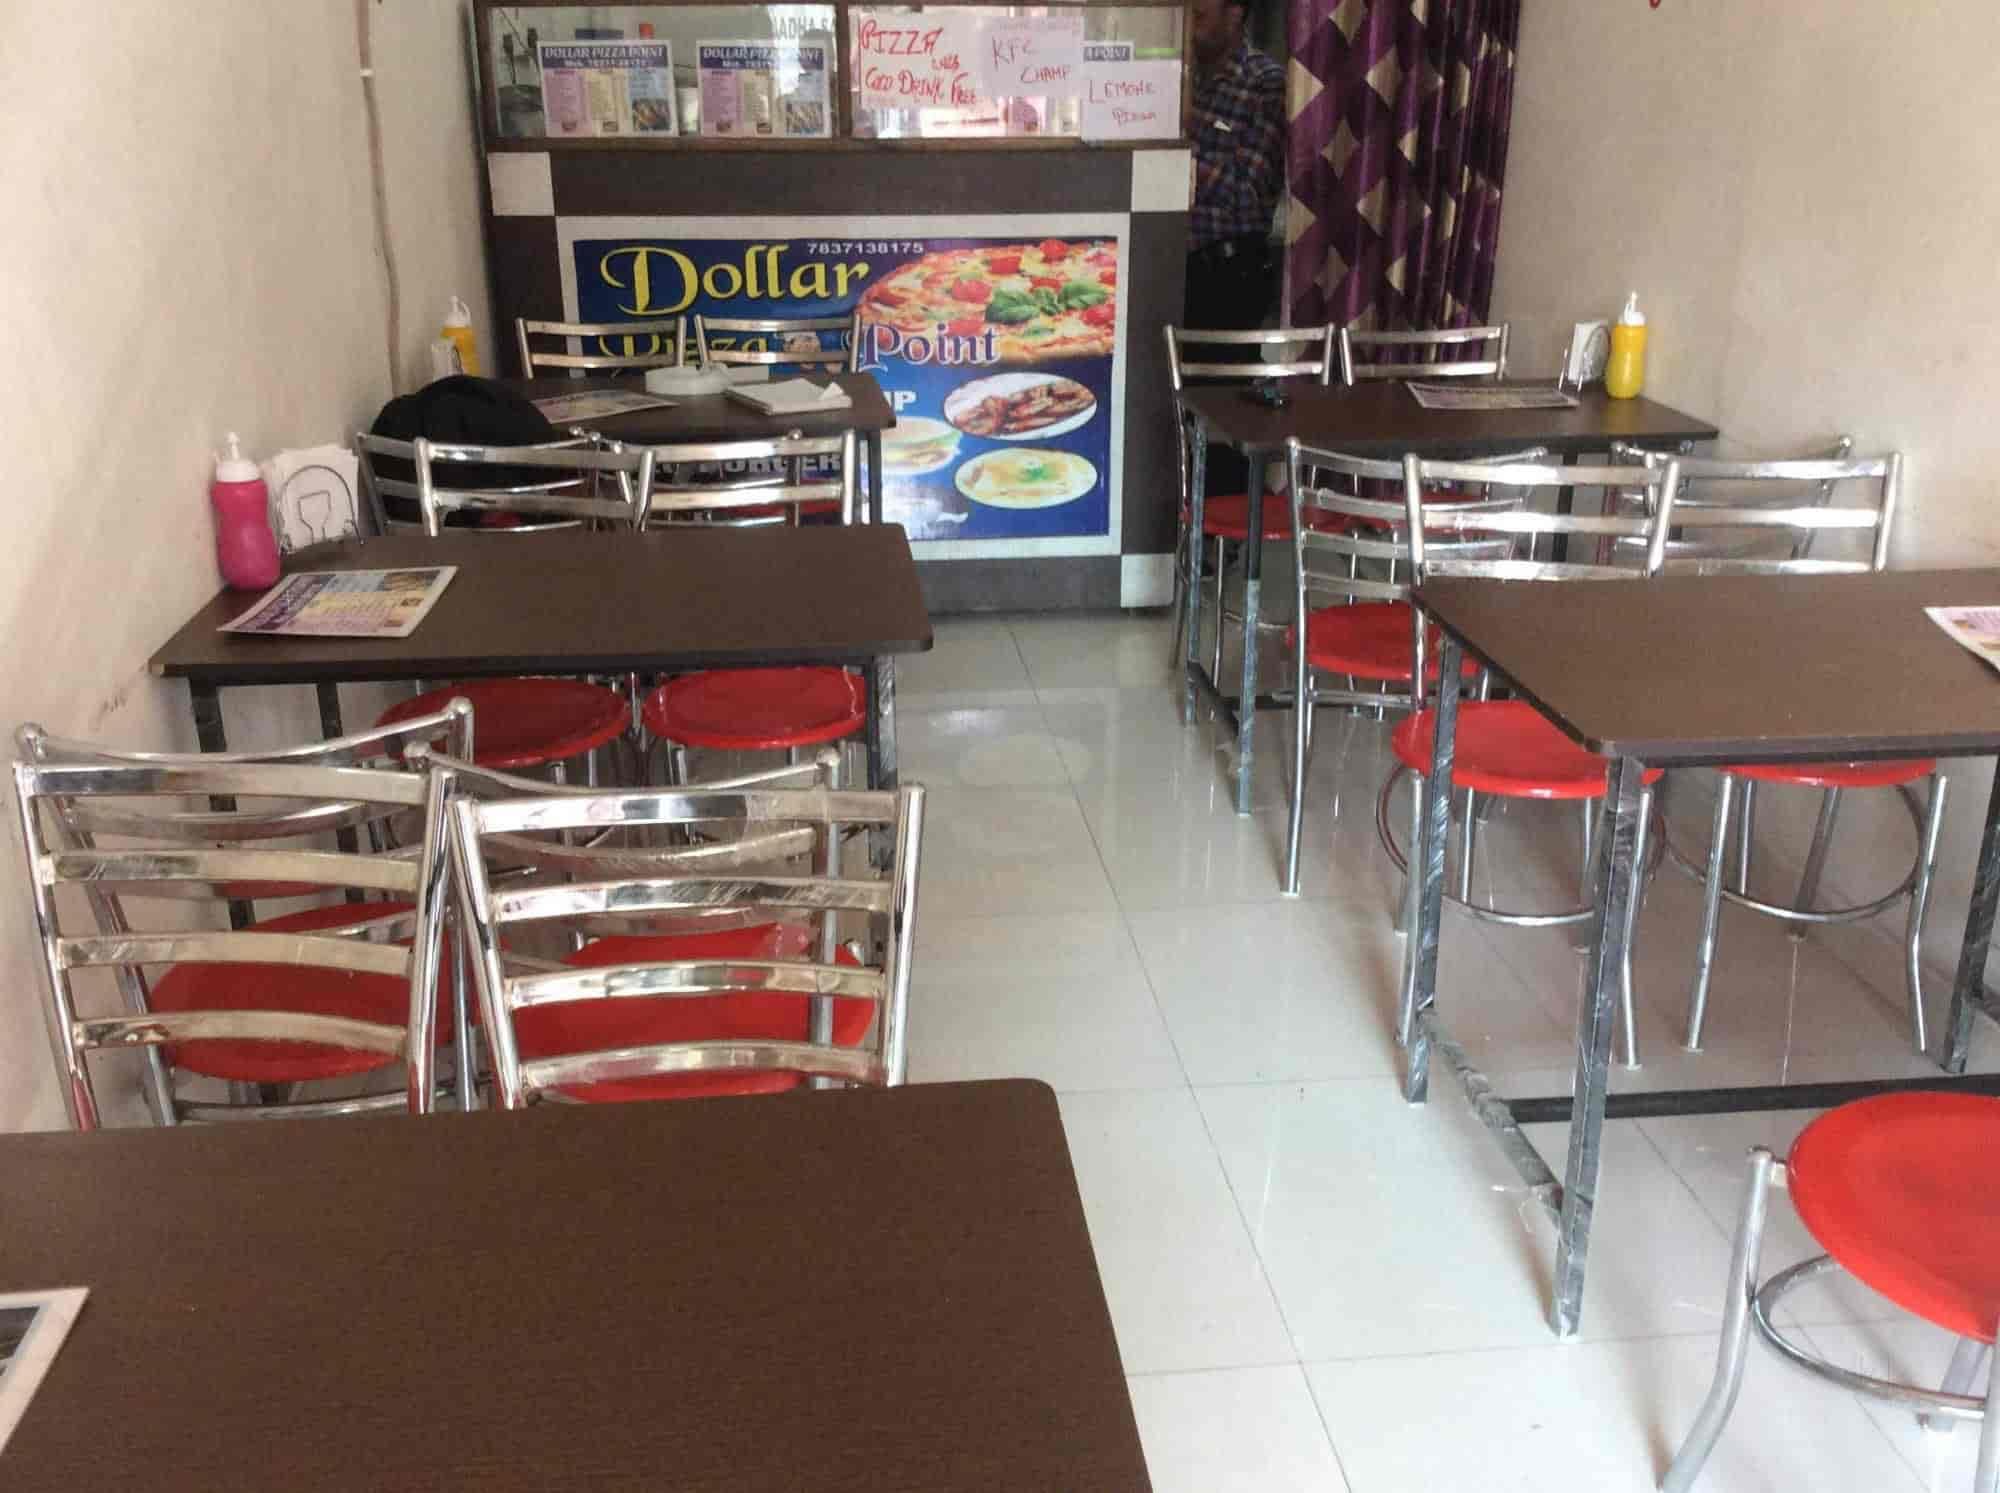 Dollar Pizza Point Reviews Bharpoor Garden Patiala 1 Ratings Justdial